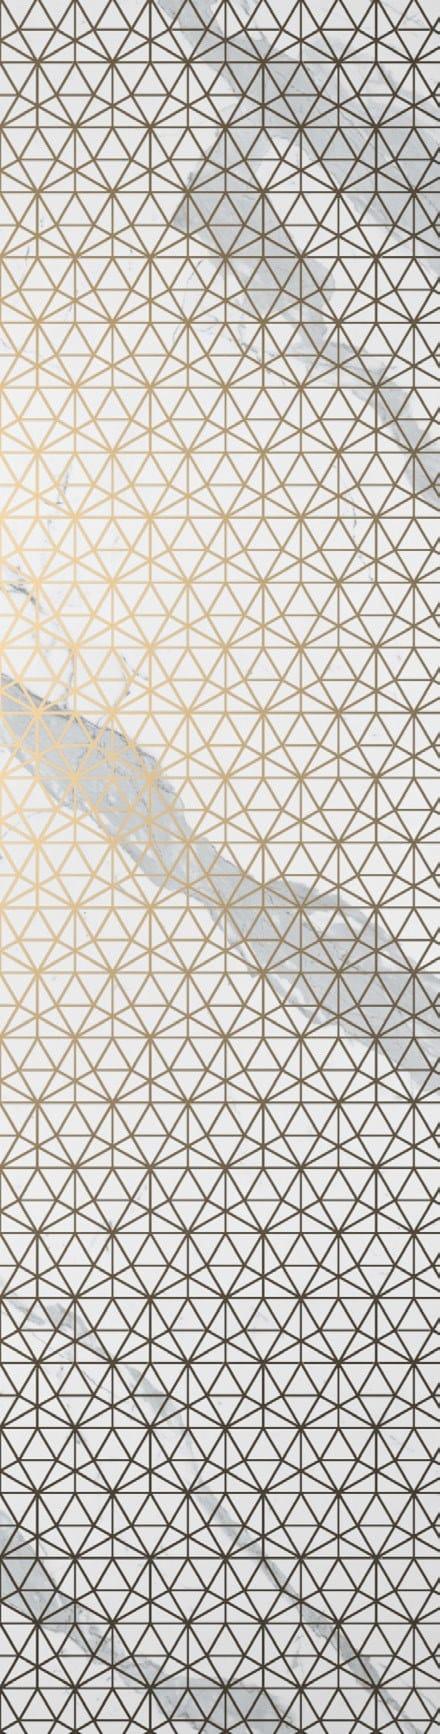 Statuario White Polished Prism Decor